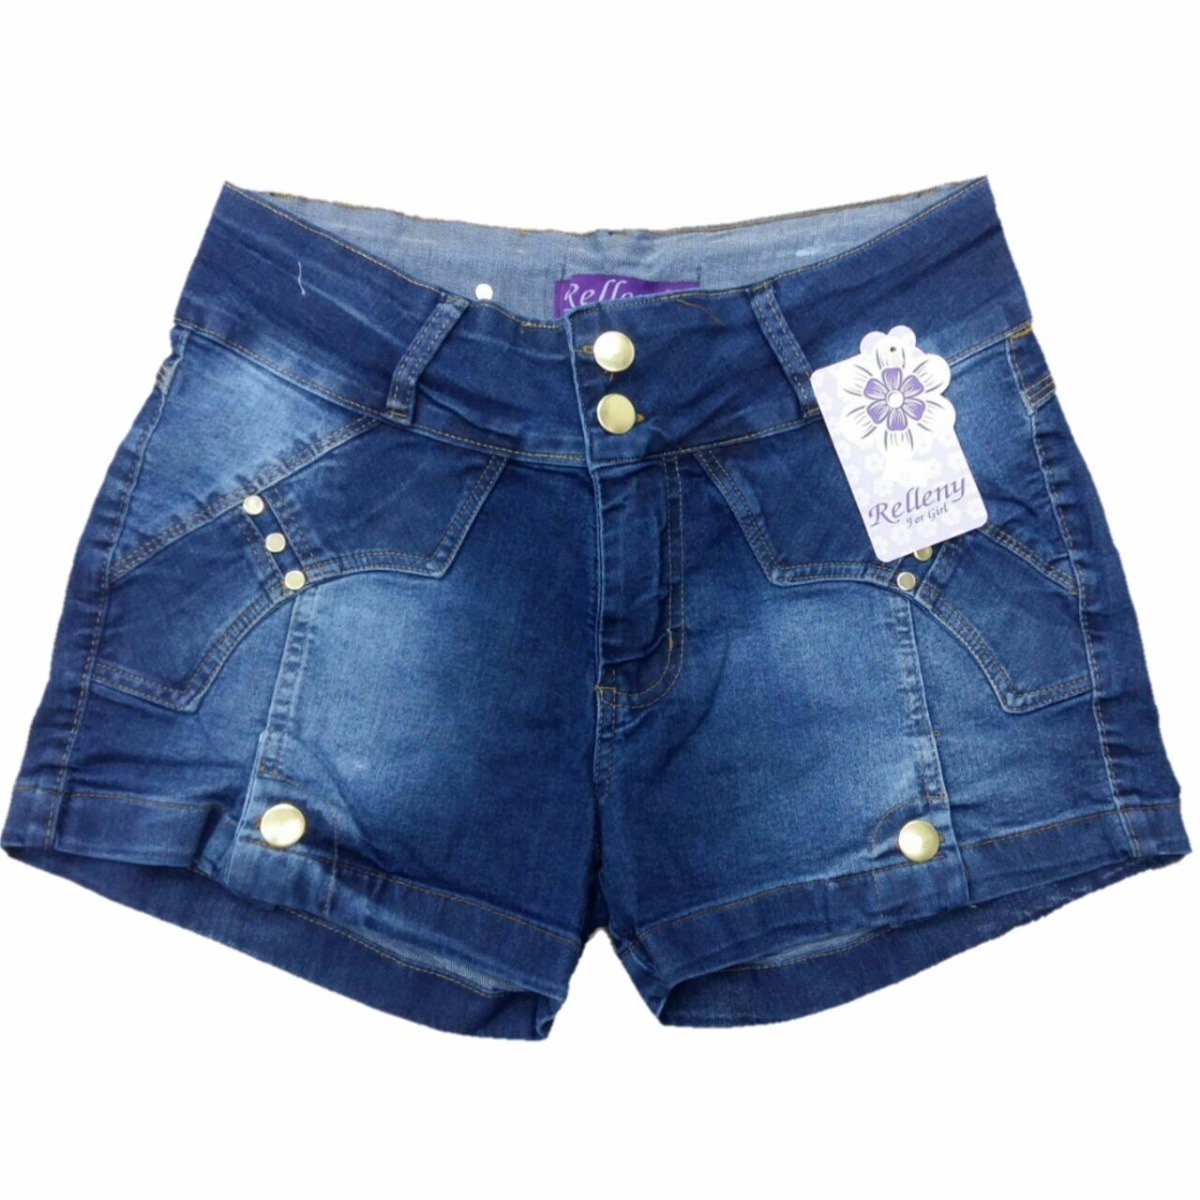 daccbef7b kit 10 short jeans femininos cintura alta hot pants atacado. Carregando  zoom.